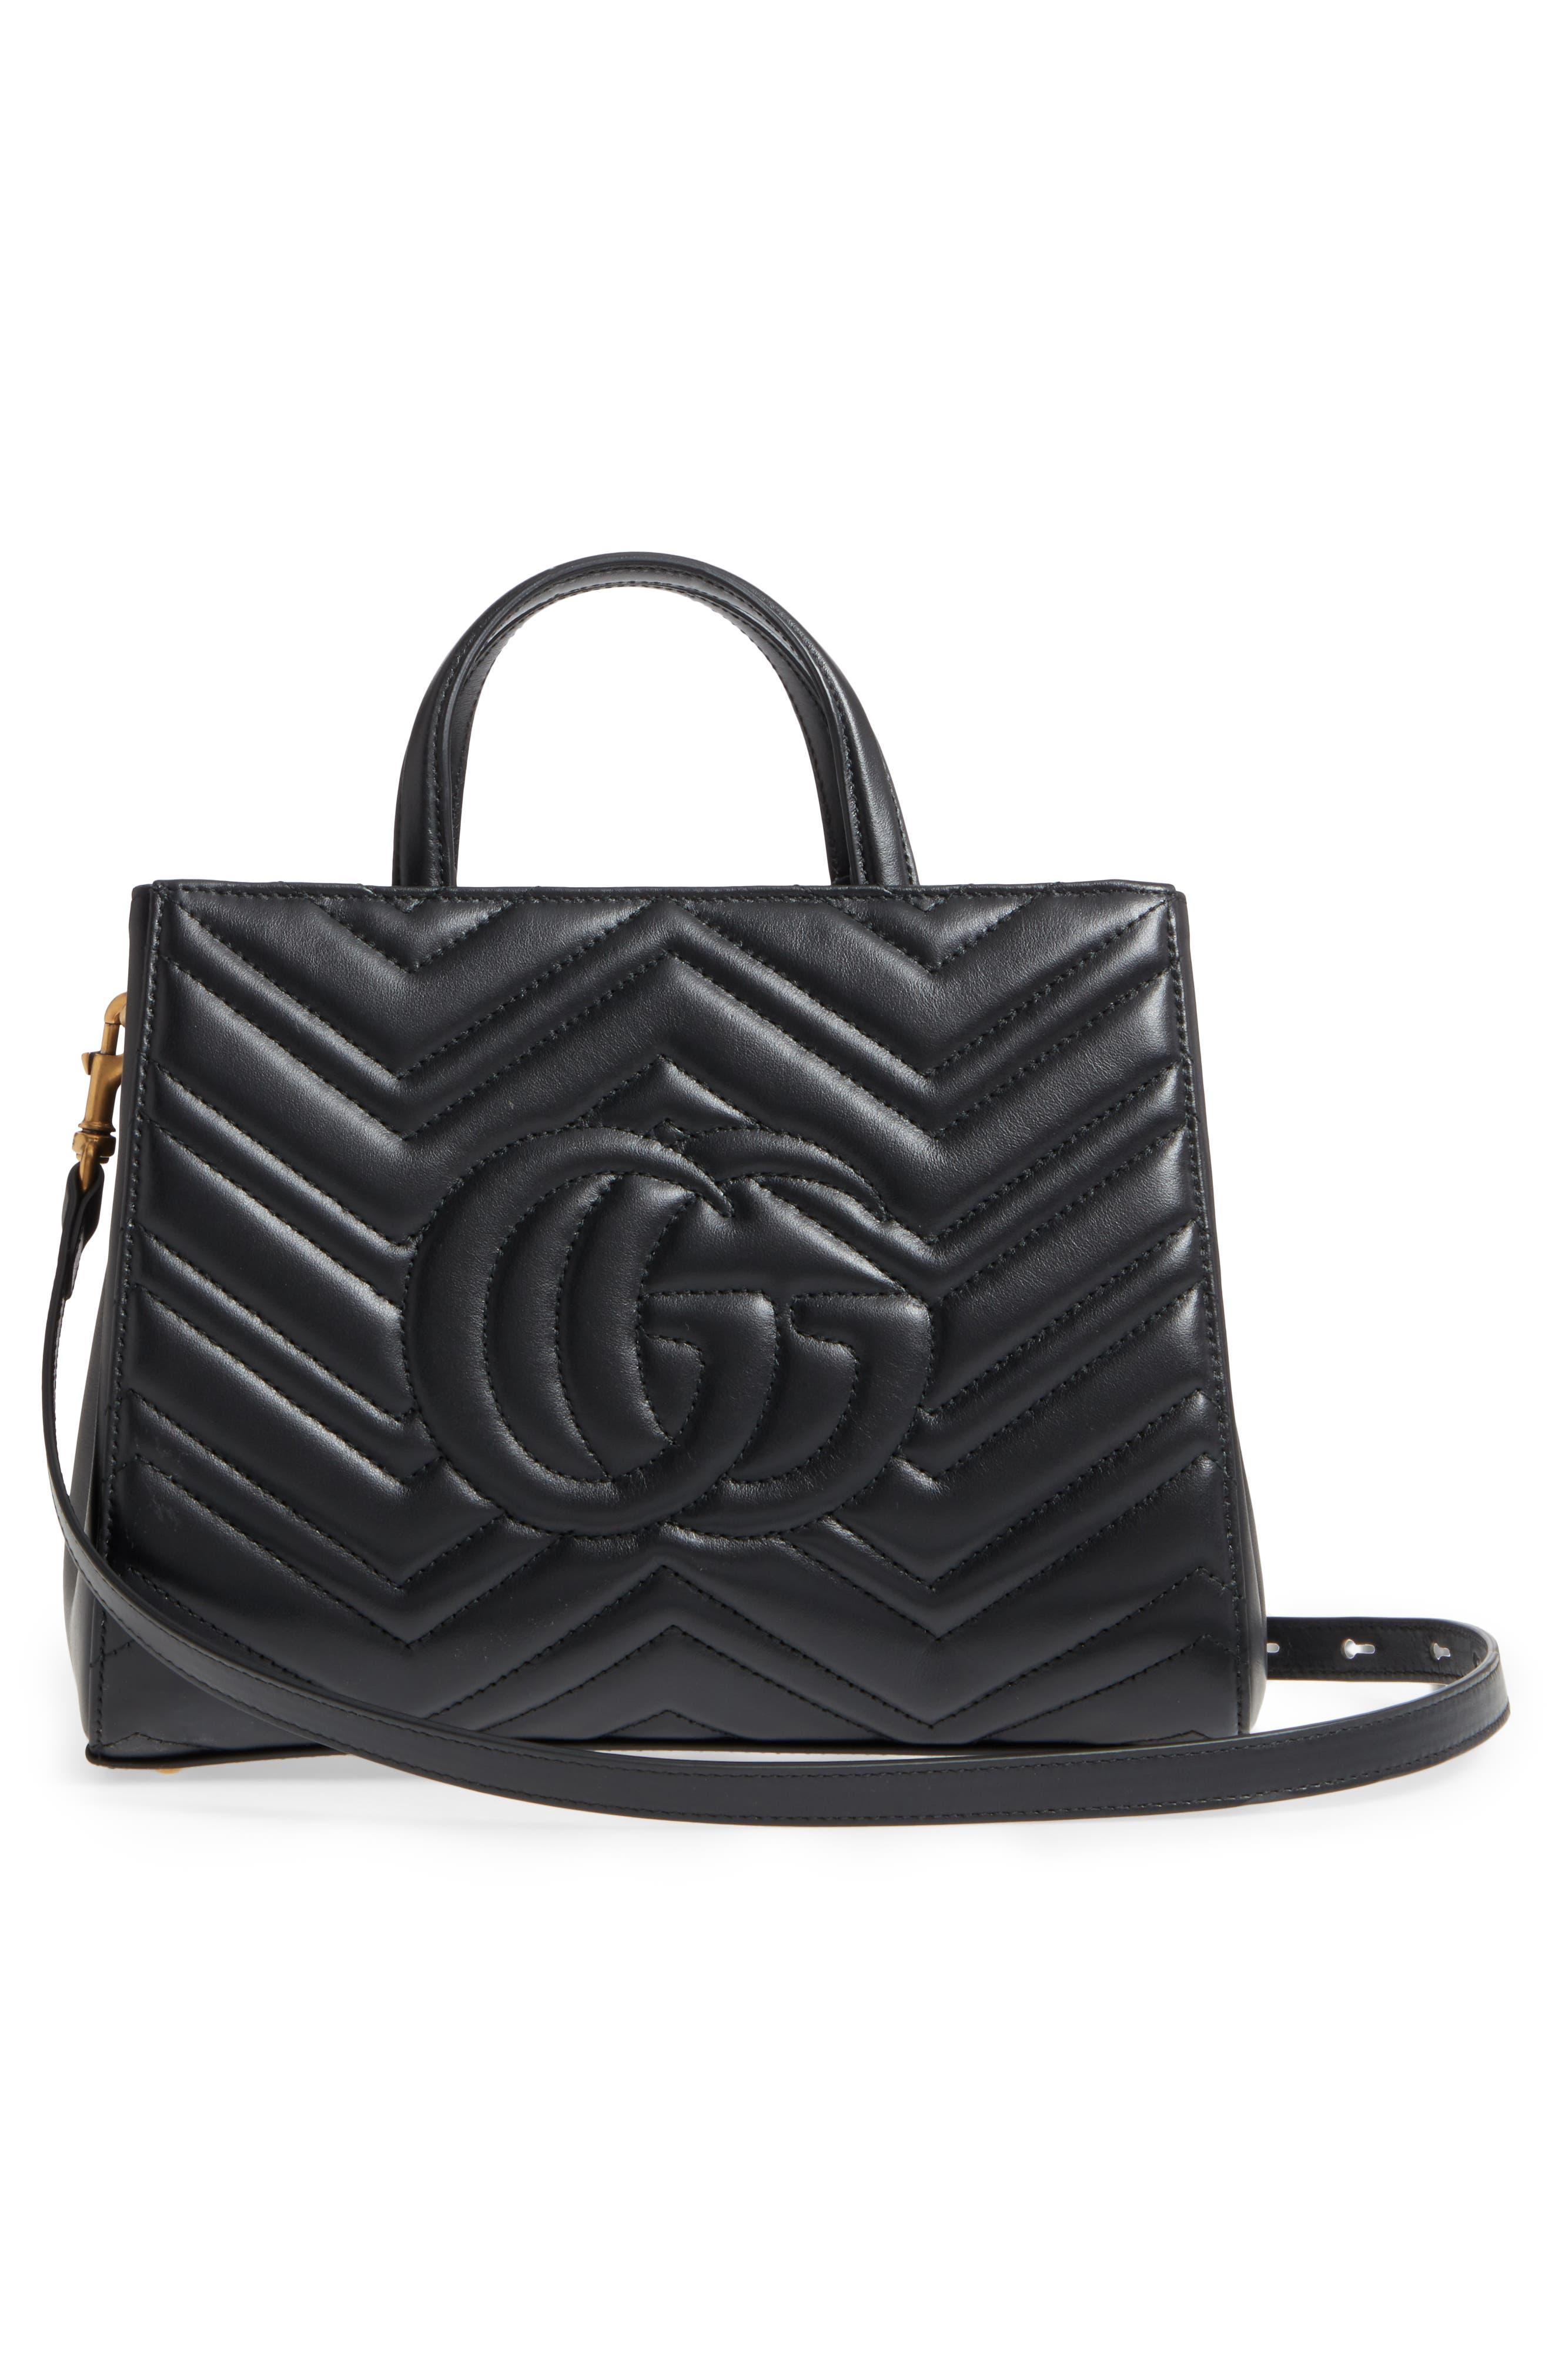 GG Small Marmont 2.0 Matelassé Leather Top Handle Satchel,                             Alternate thumbnail 3, color,                             Nero/ Nero